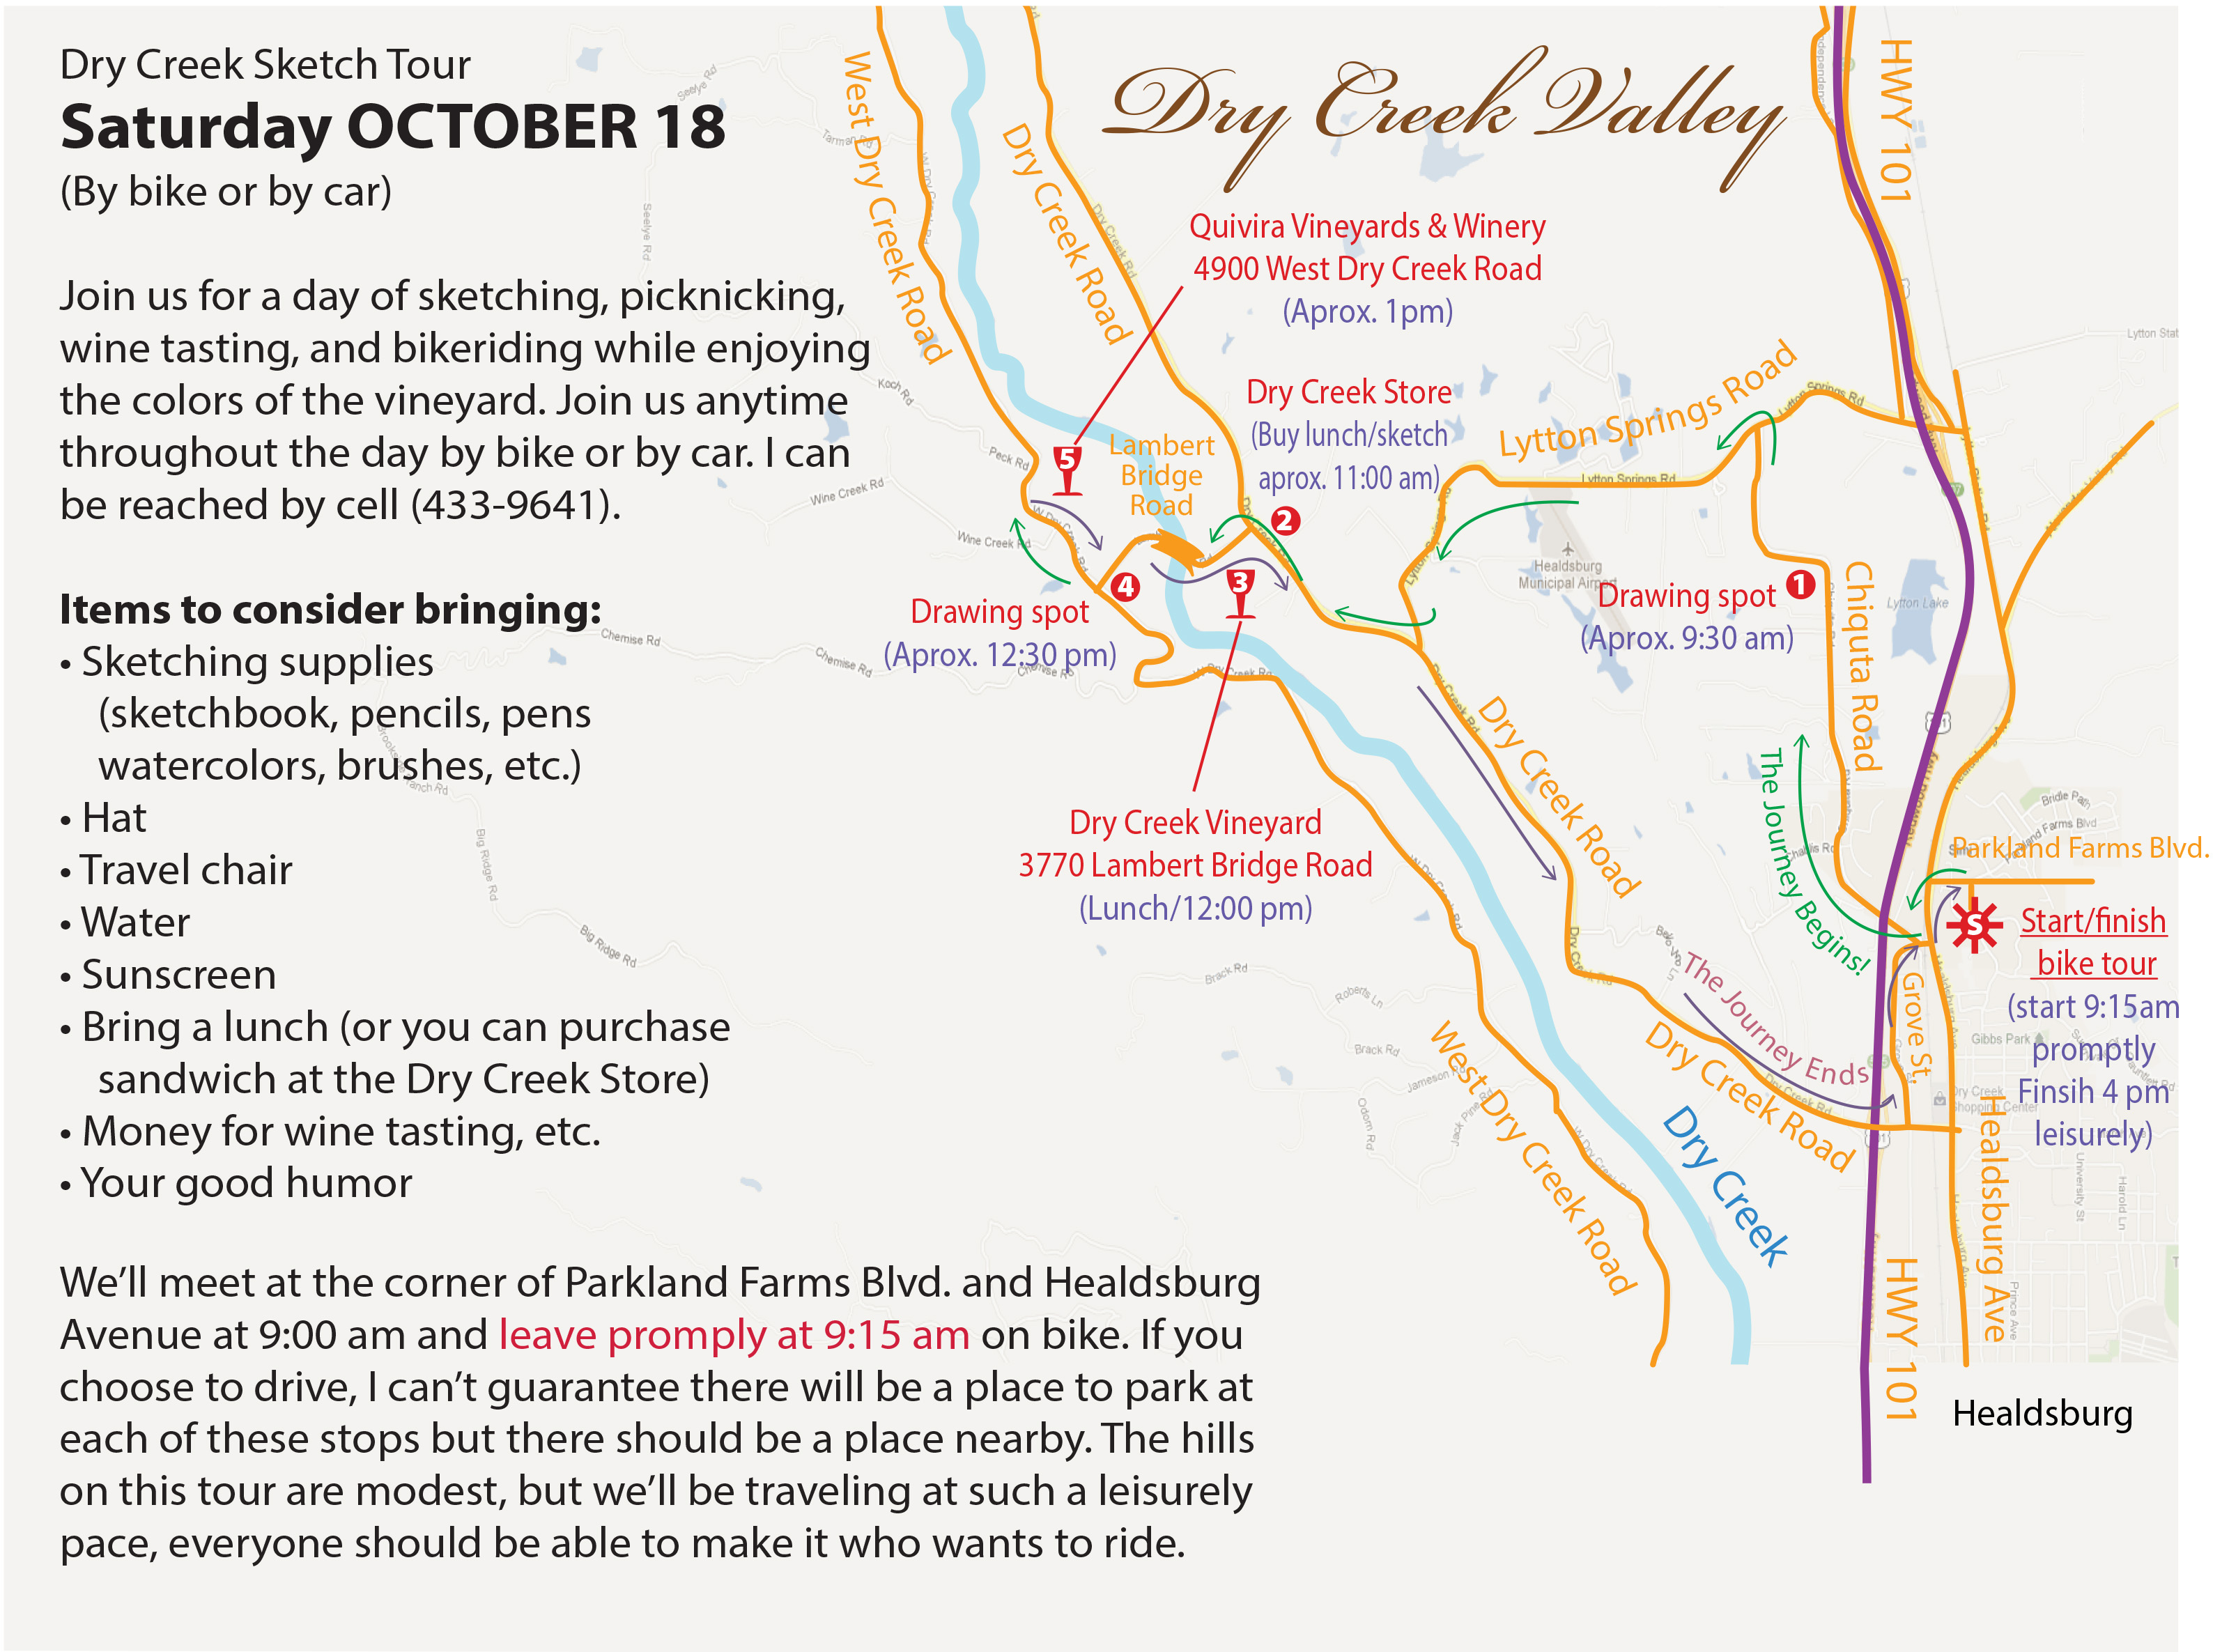 Dry Creek Valley Sketch Trip